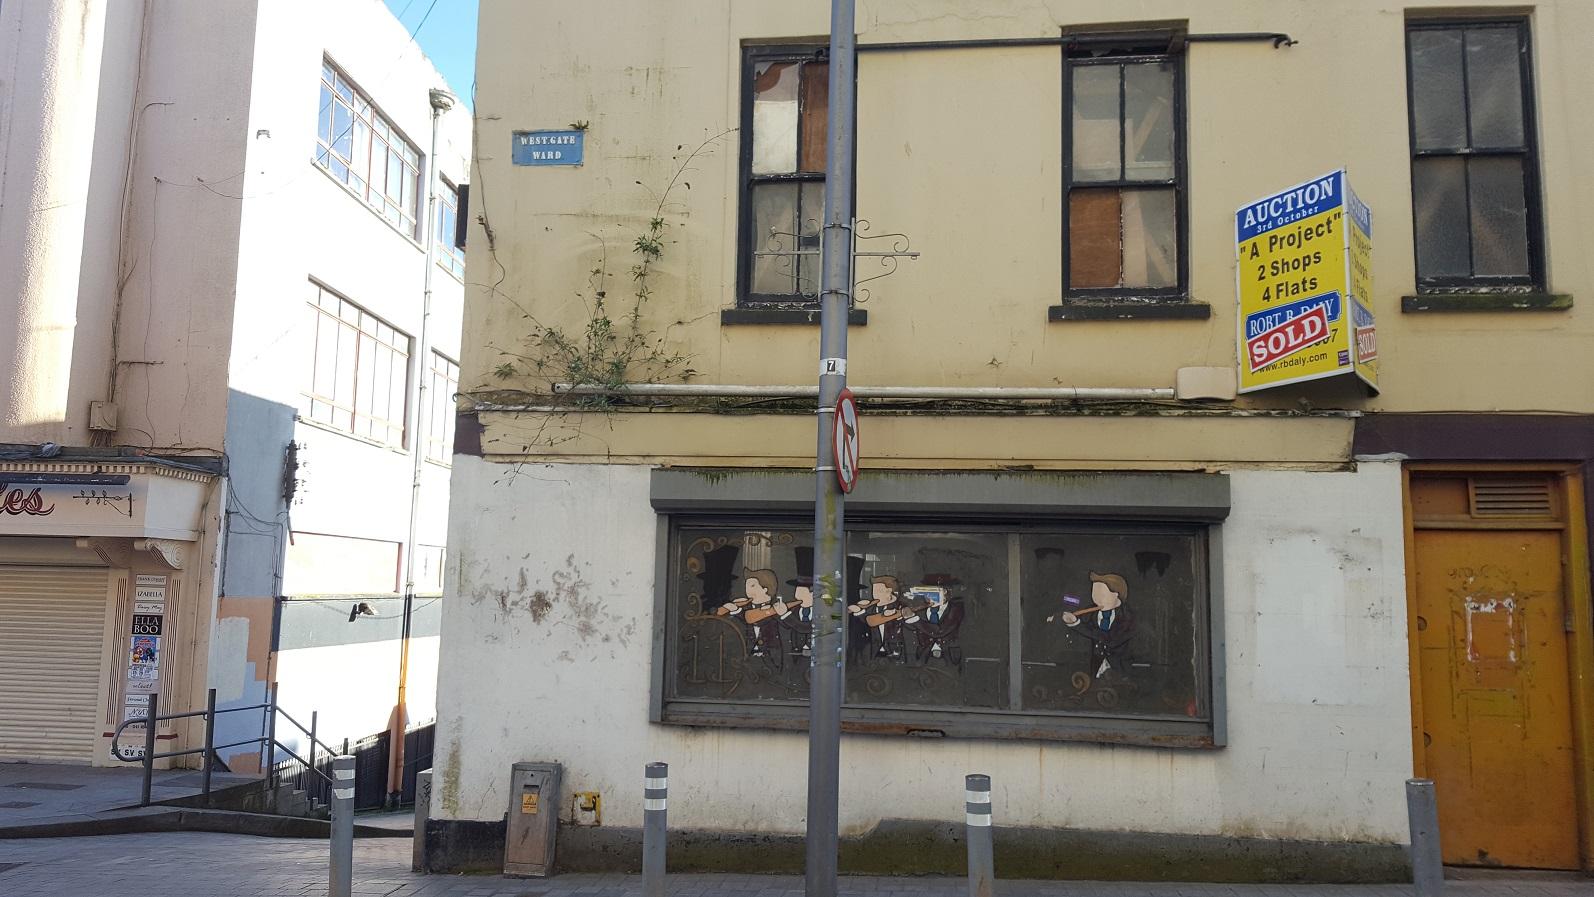 No 12 week scan at OLOL Drogheda June 2018